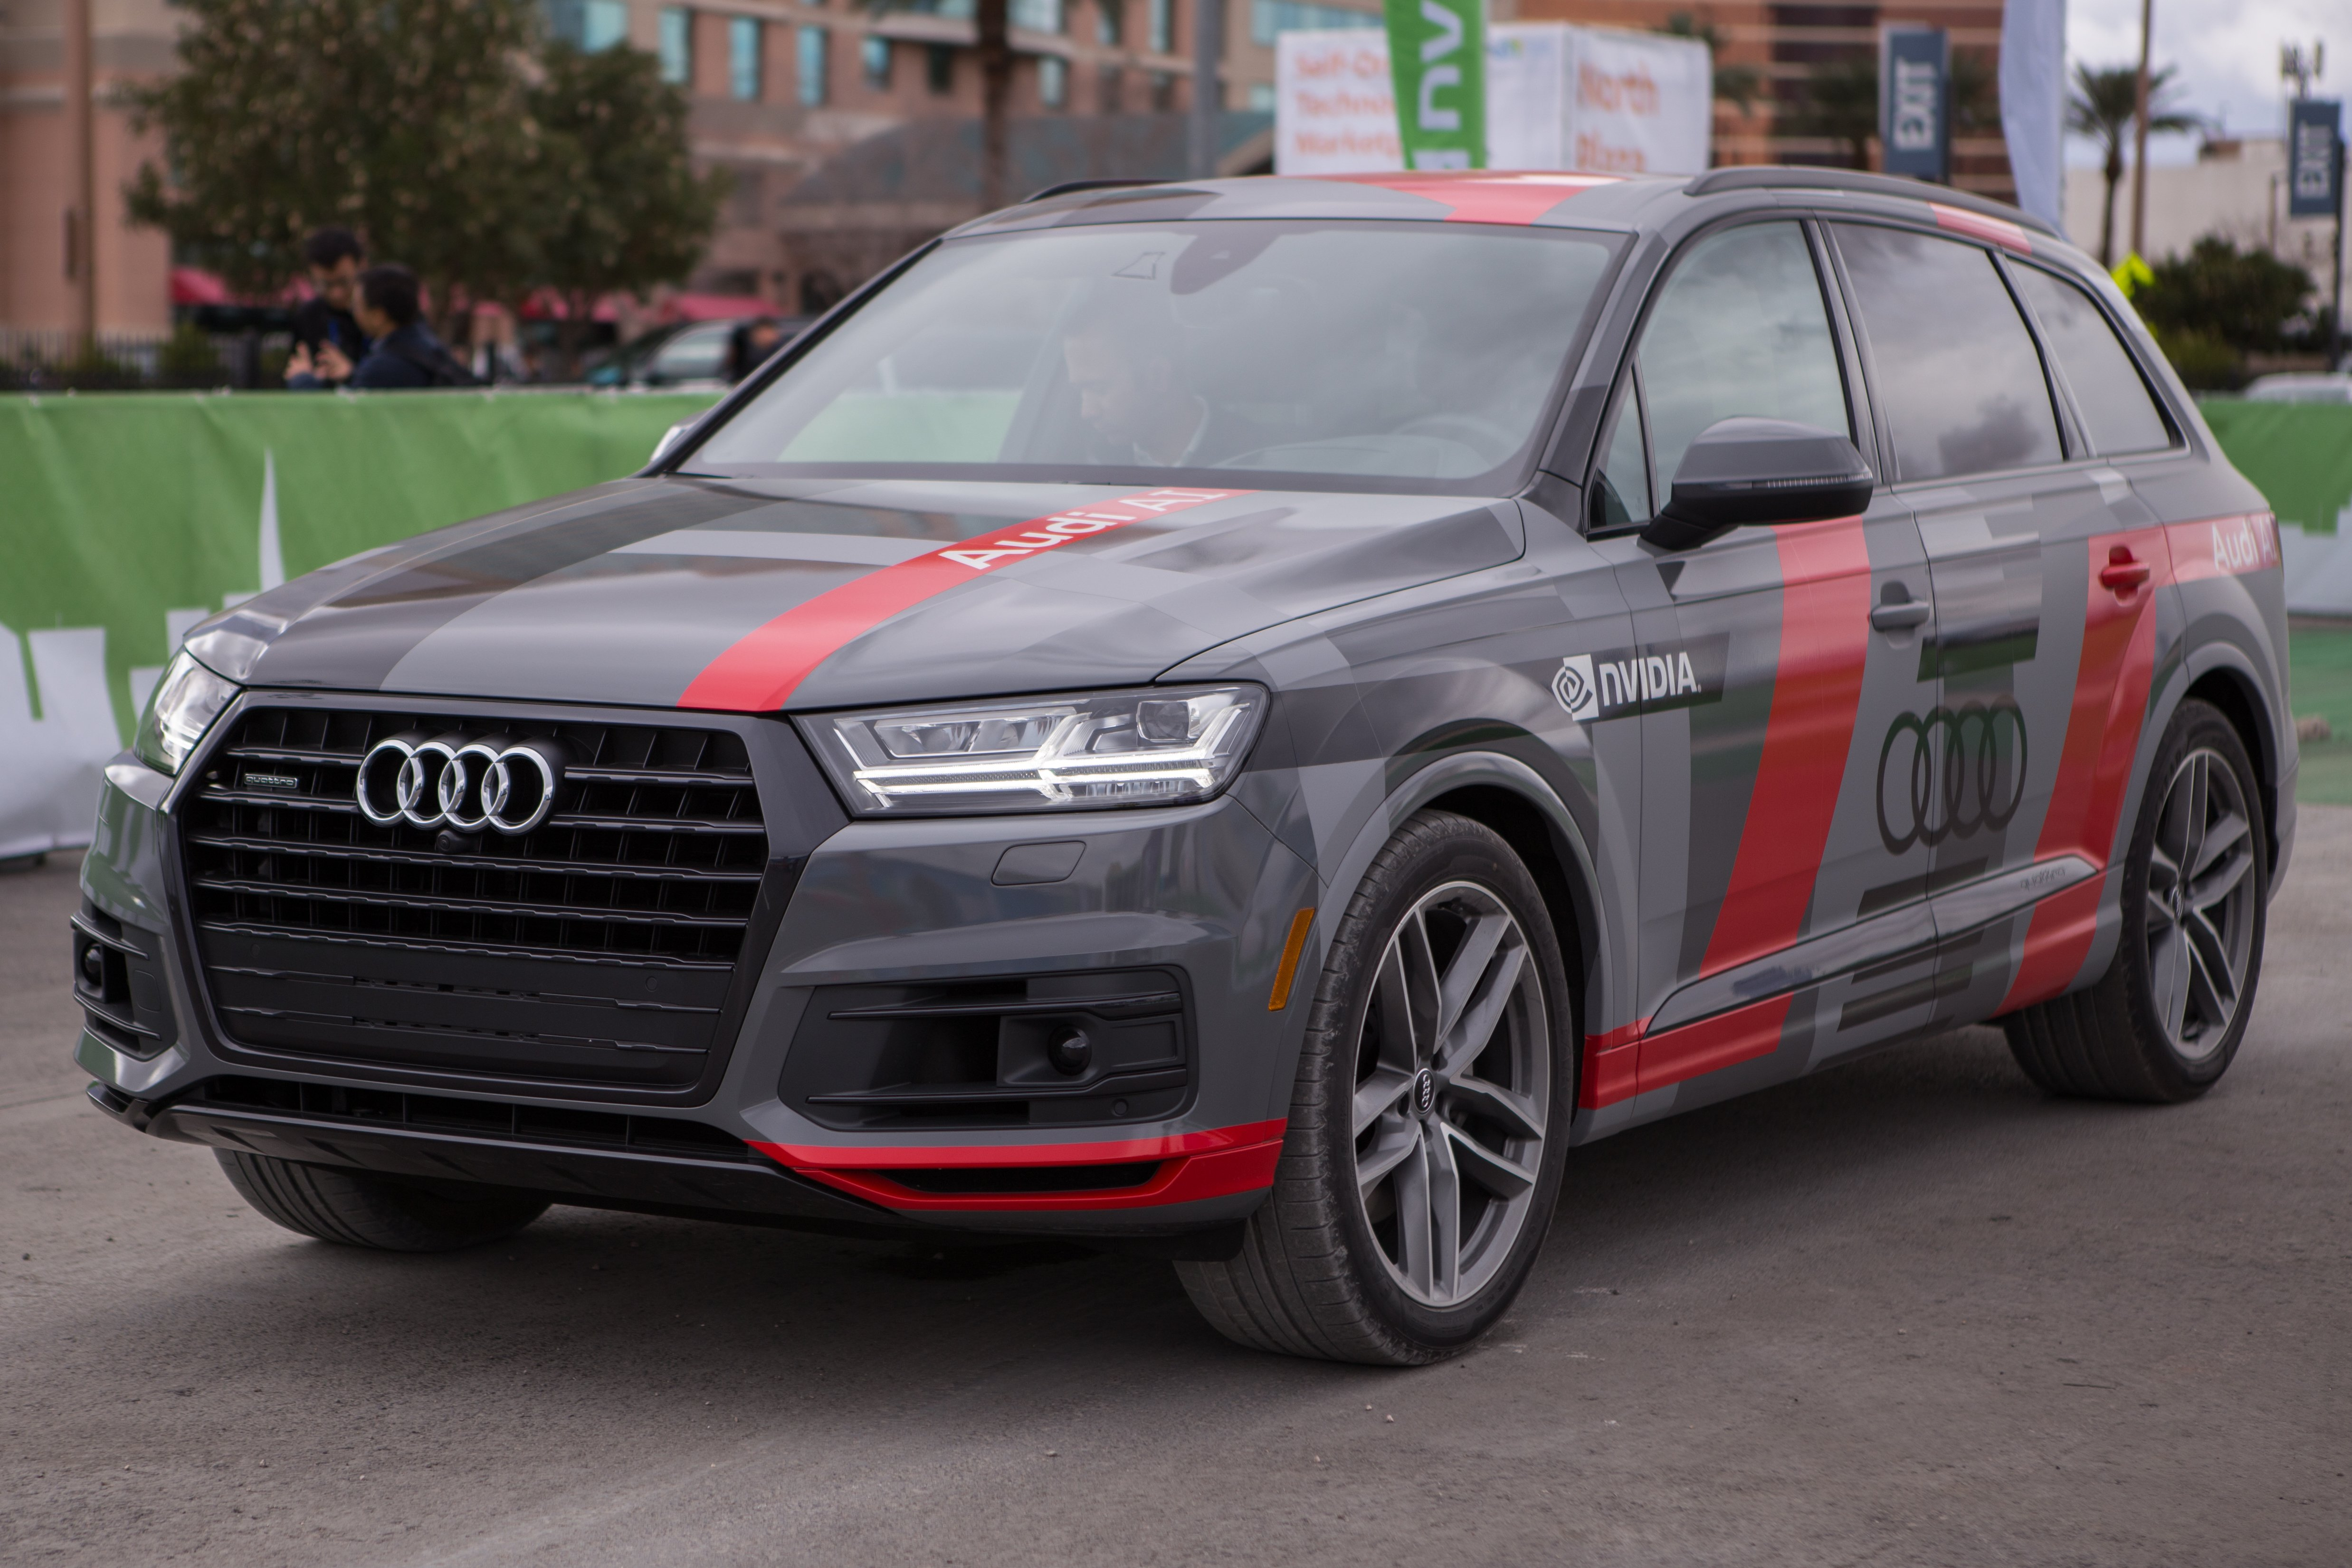 Audi to Introduce Level 3 Autonomous Vehicle This Year